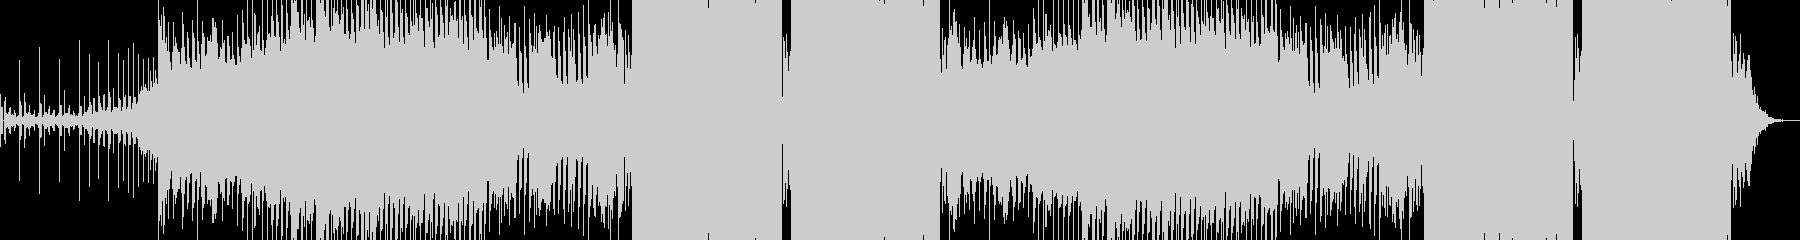 【EDM】エネルギッシュ・鼓舞_01の未再生の波形